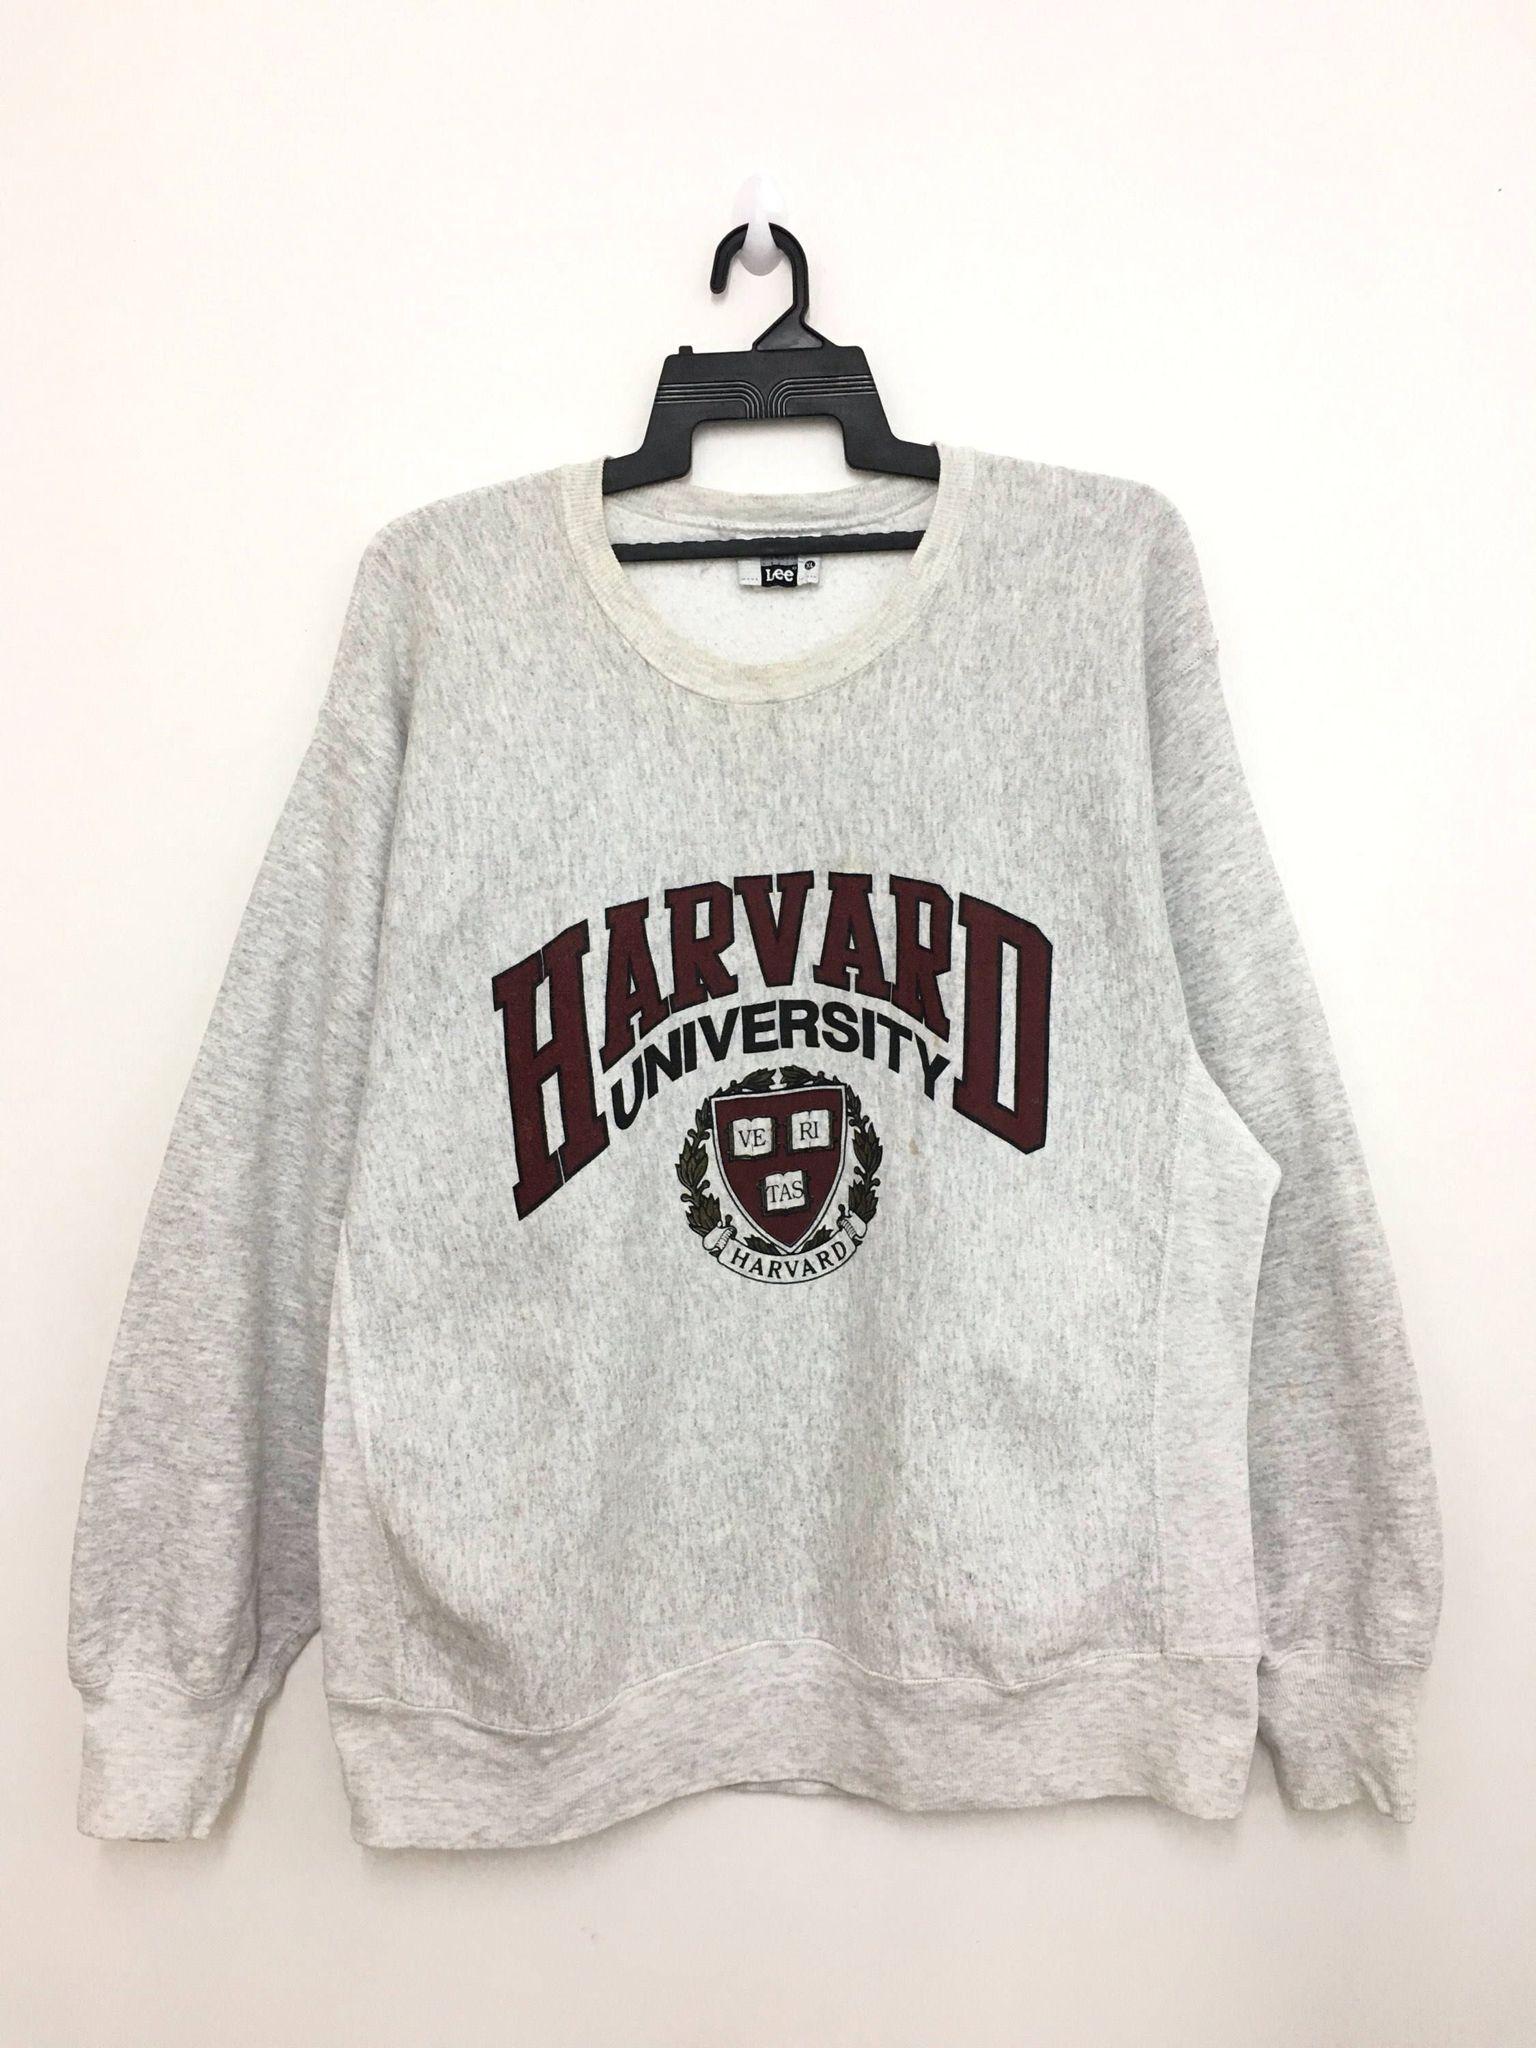 Pin By Grace Nufer On Gift Ideas Sweatshirts University Sweatshirts Grey Sweatshirt [ 2048 x 1536 Pixel ]